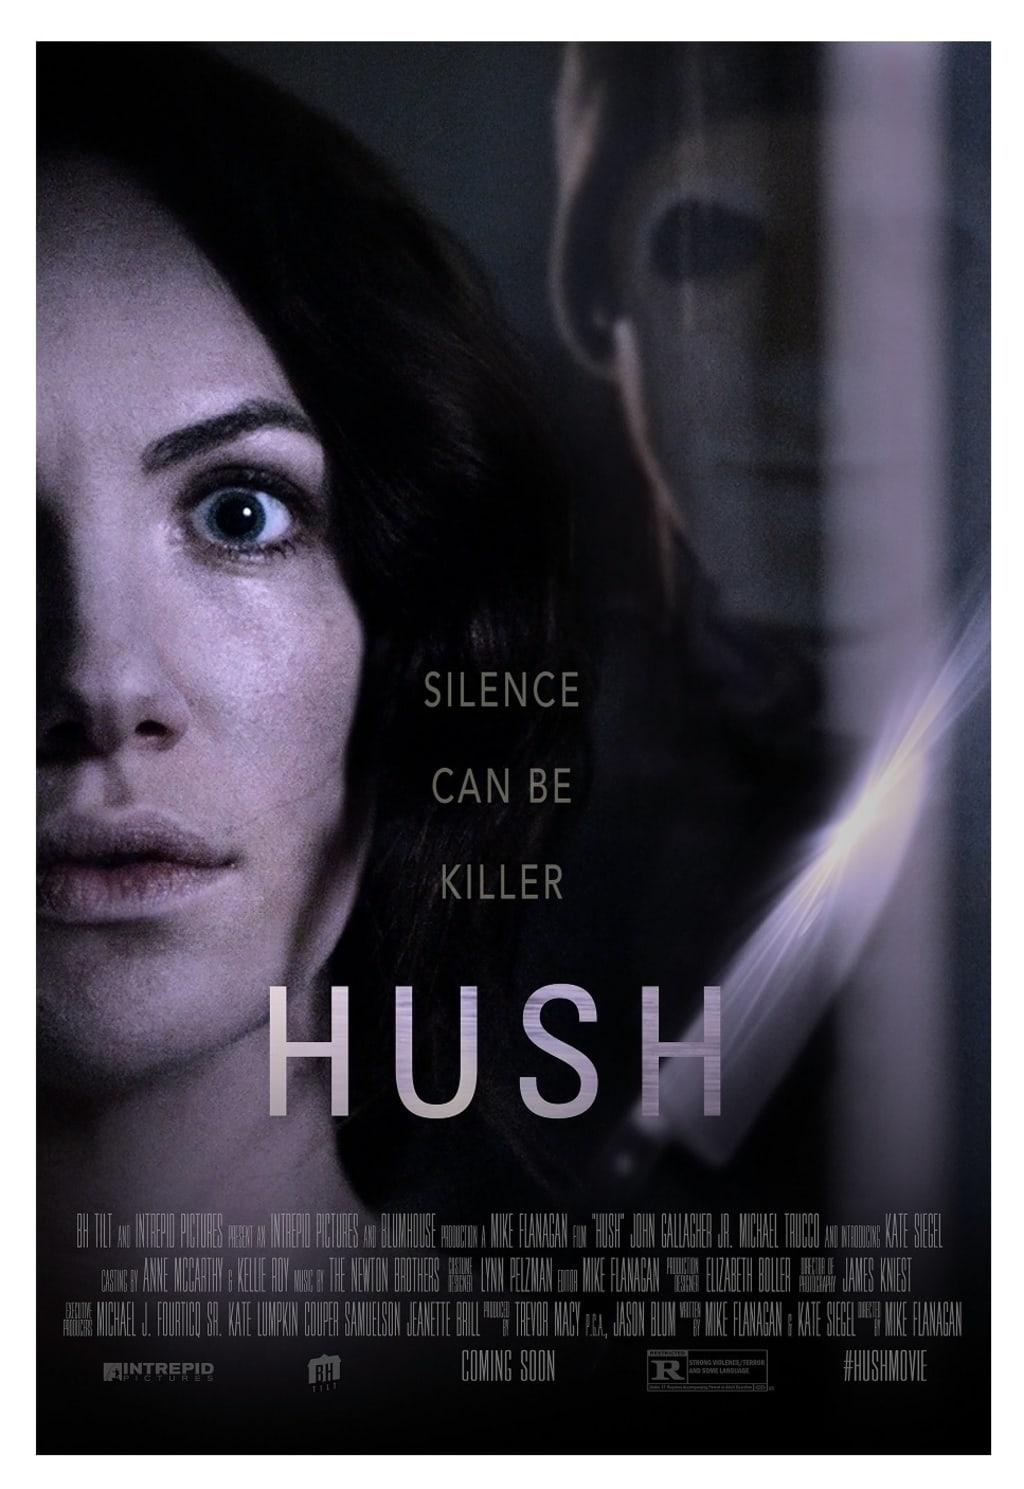 A Common Man's View: 'Hush'